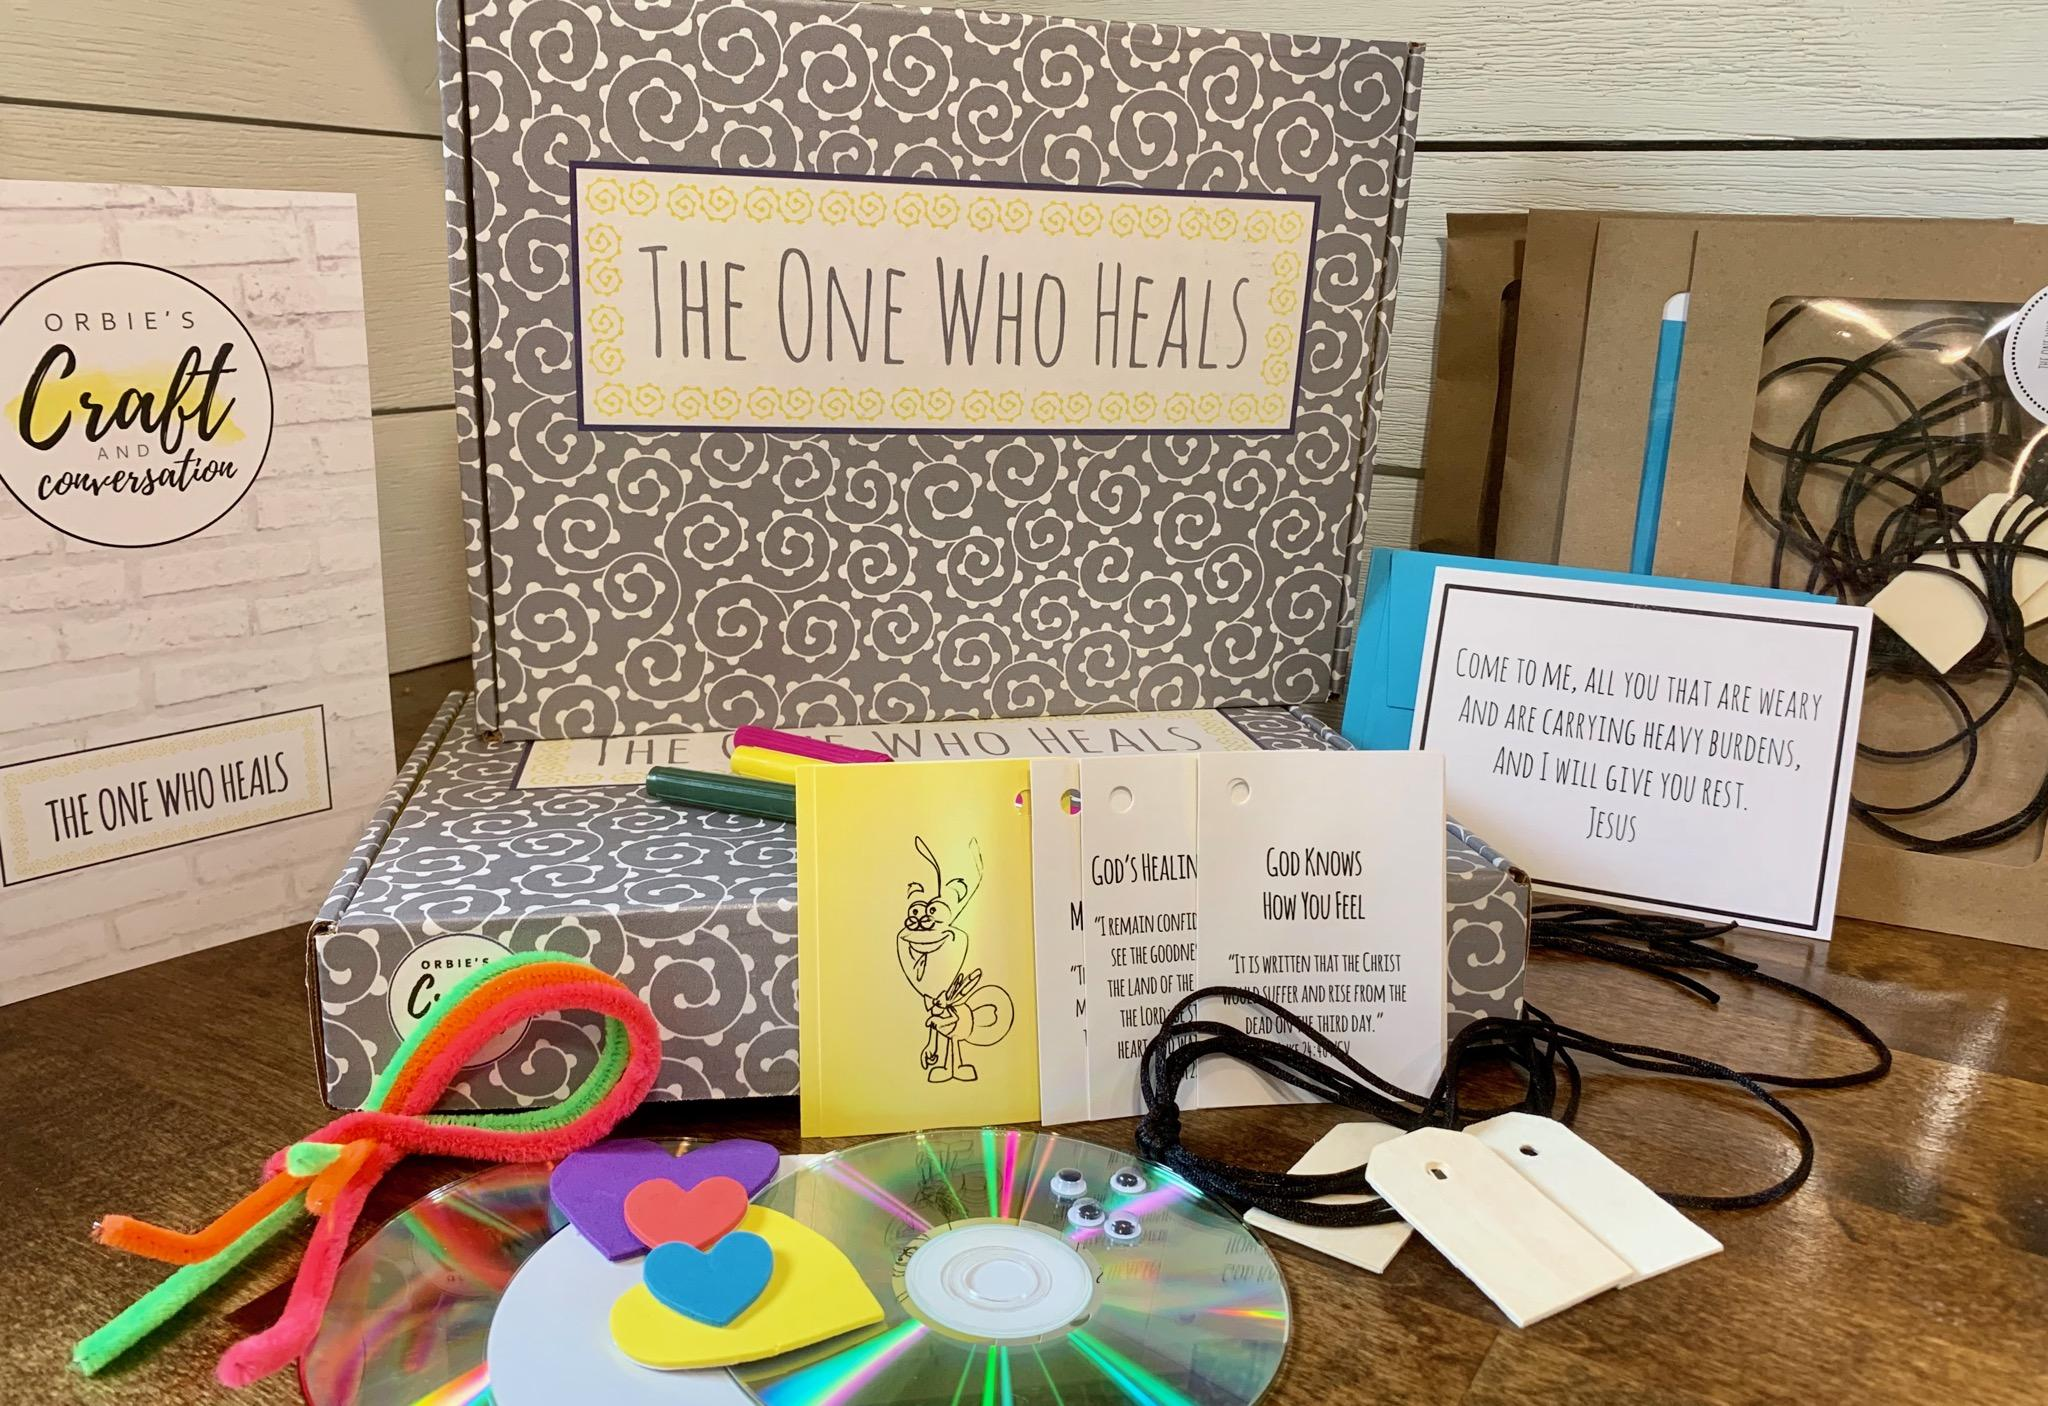 The One Who Heals.jpg